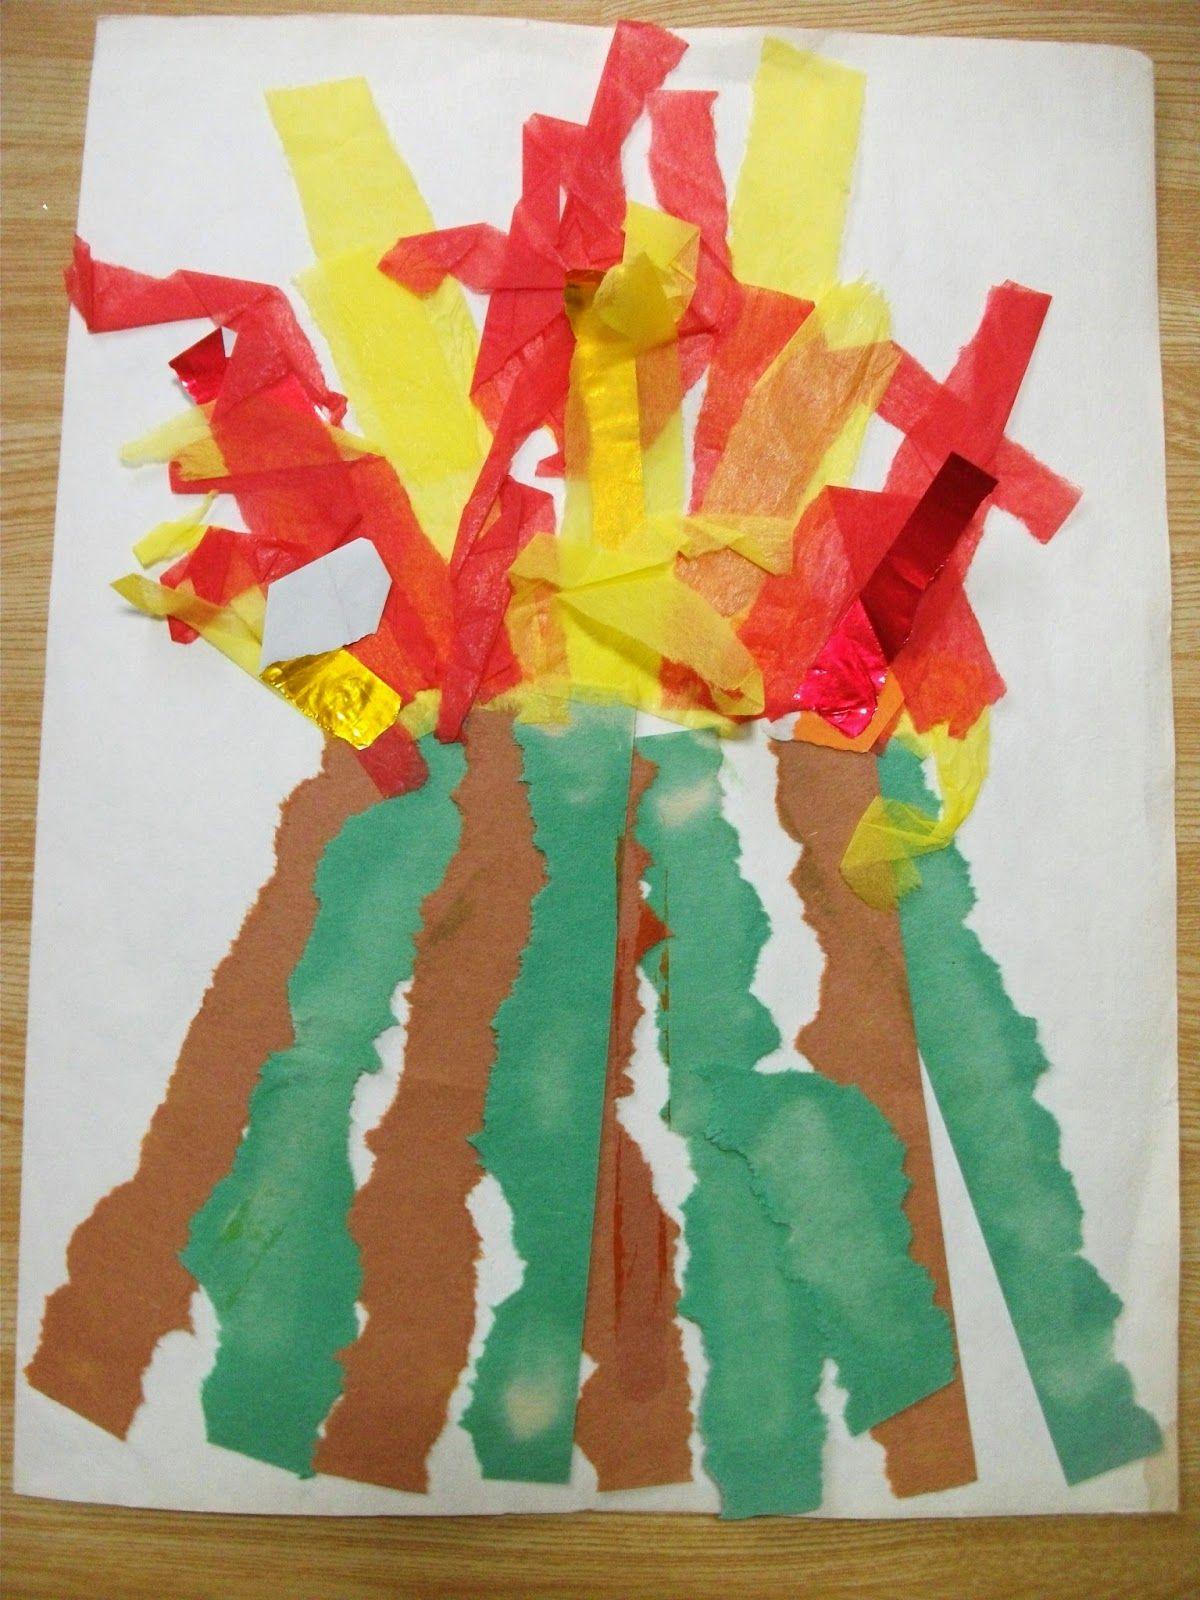 Preschool Crafts For Kids Paper Strips Volcano Craft